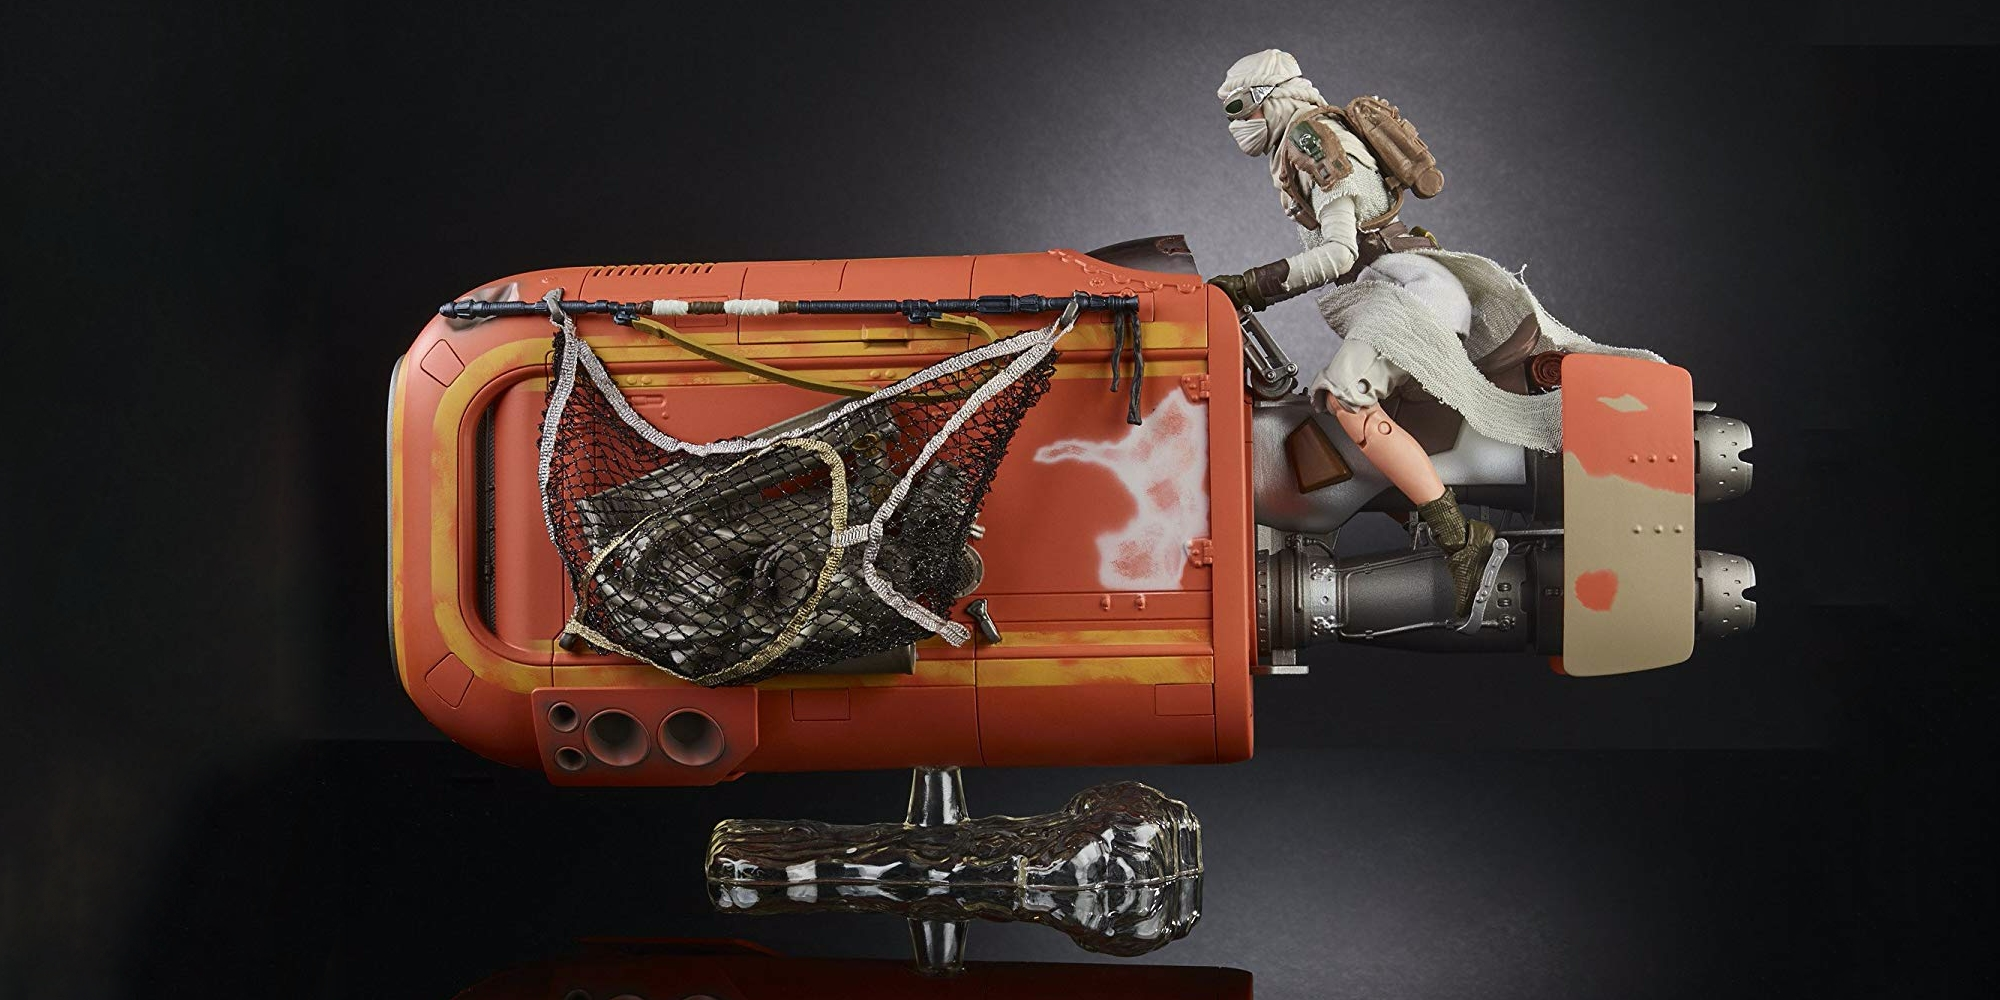 STAR WARS The Black série Collectable Rey/'s Speeder Jakku et figure